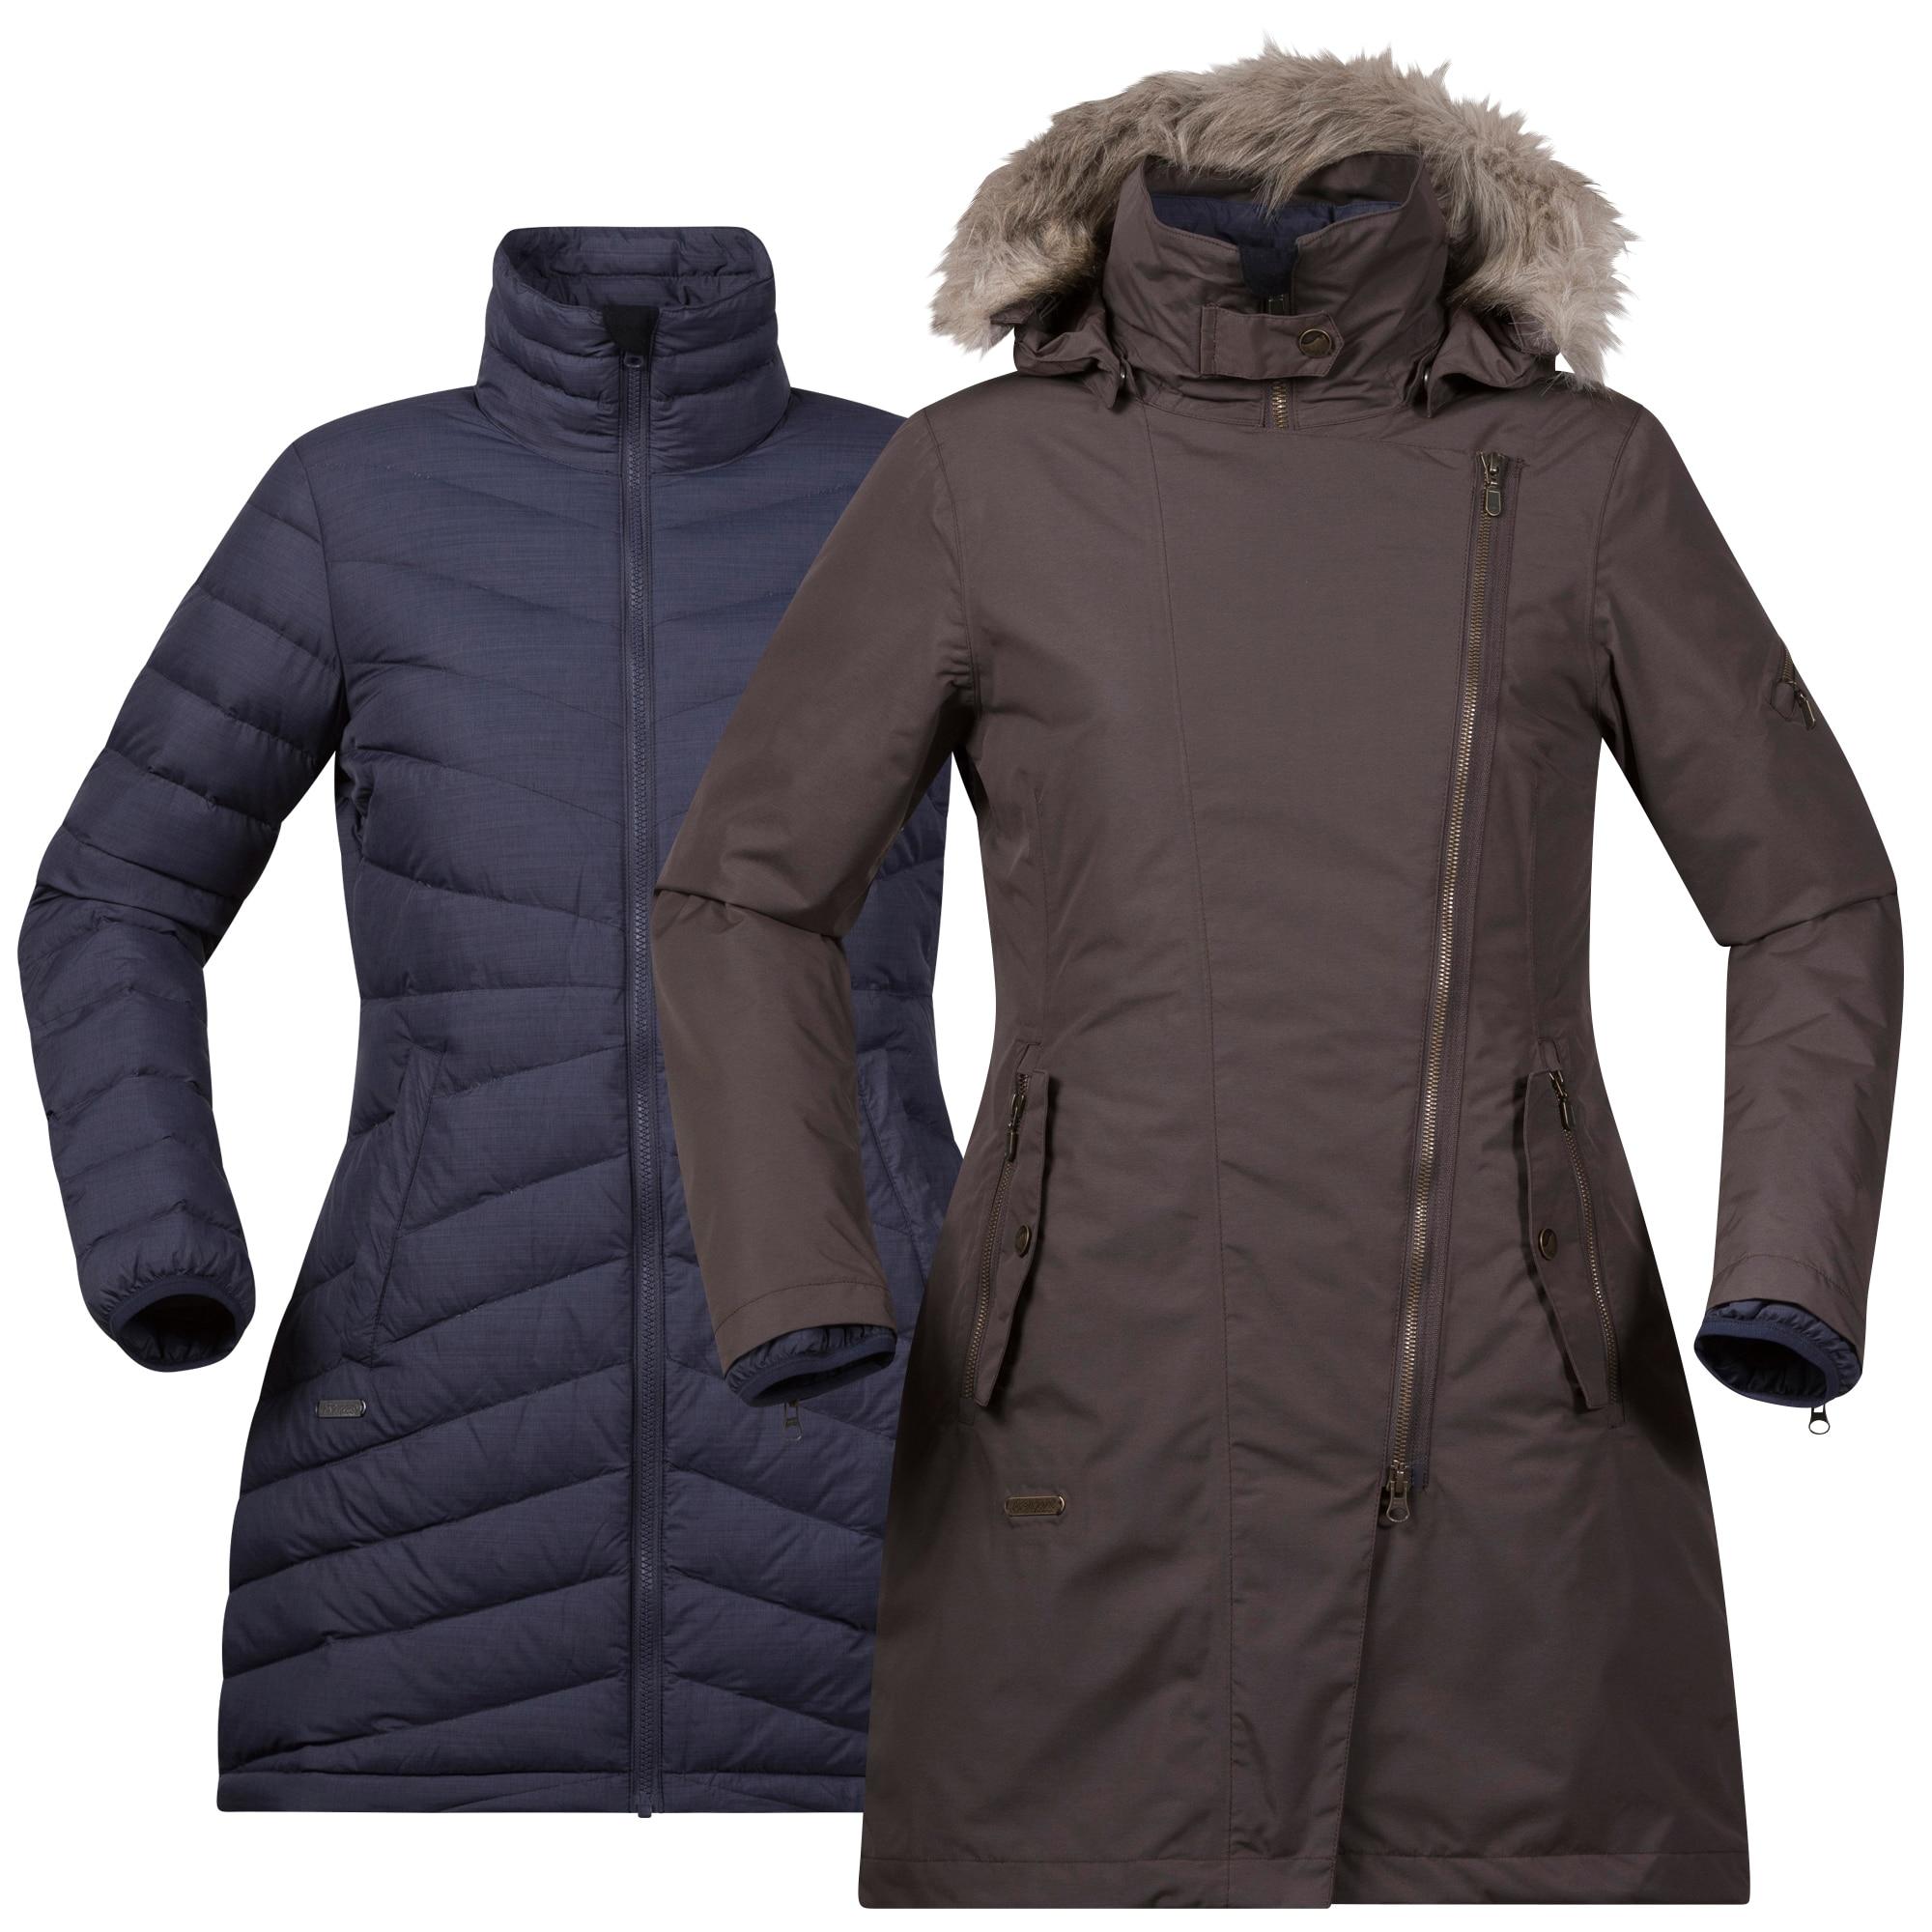 Sagene 3in1 Lady Coat